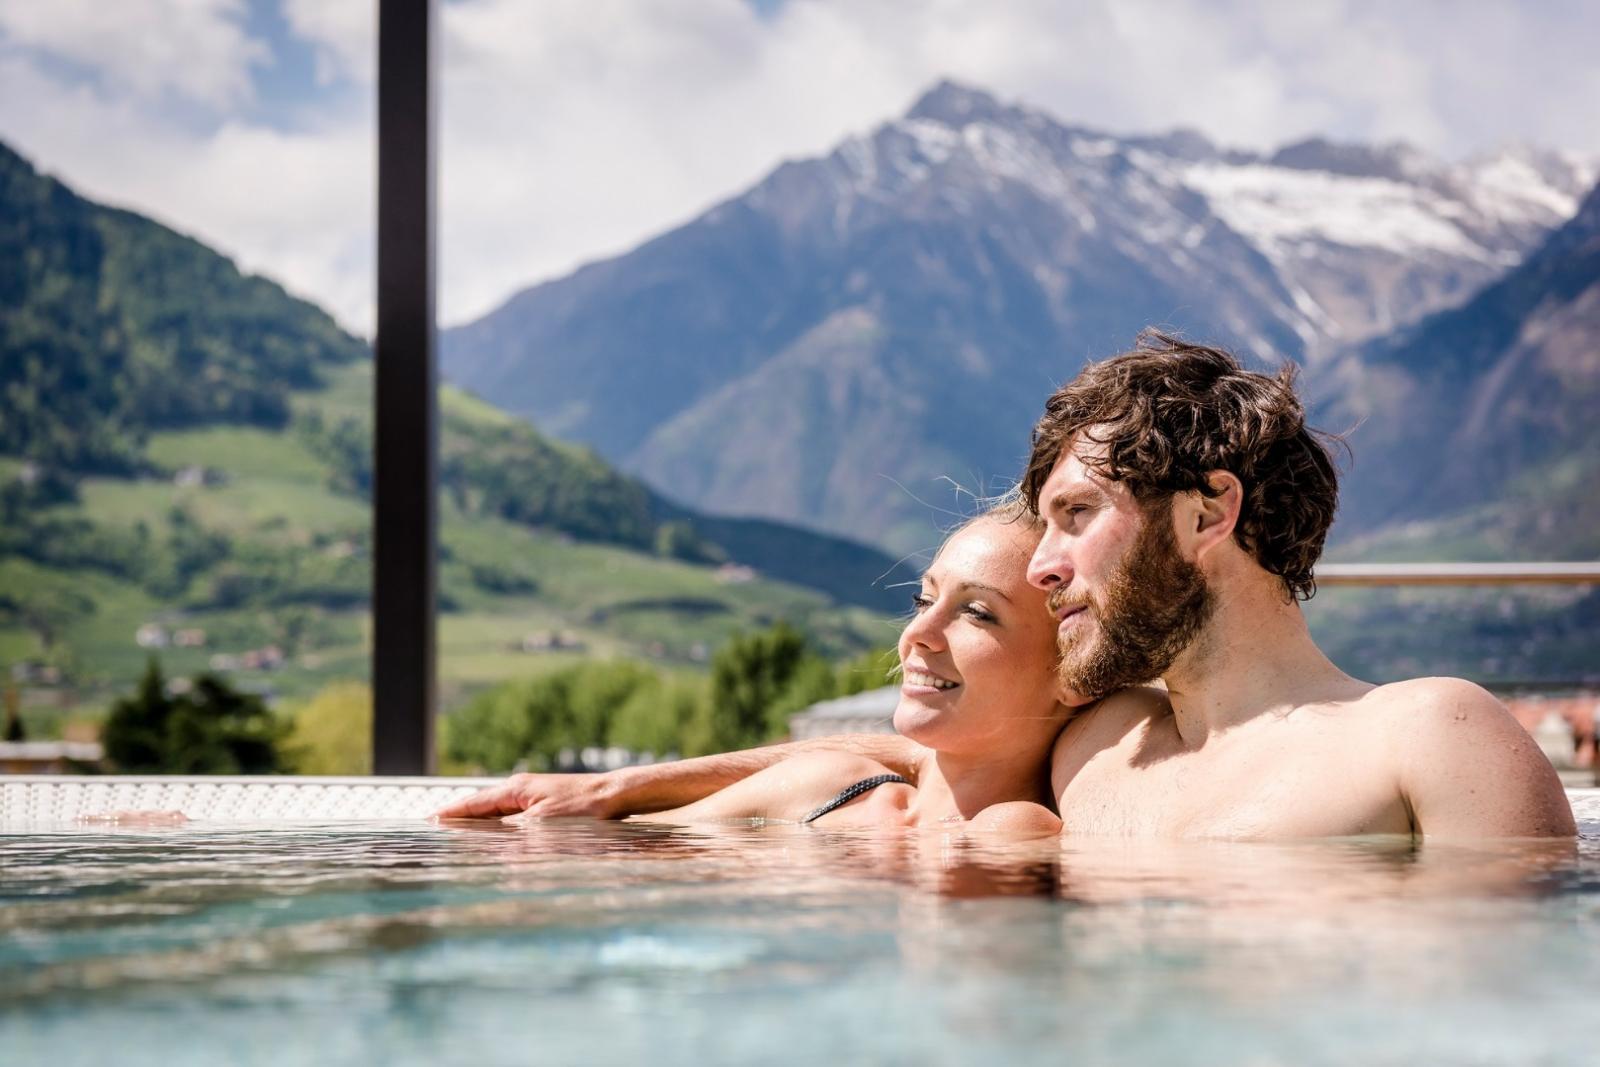 Erdwallsauna: Foto vom Wellnesshotel Hotel Therme Meran | Wellness Südtirol